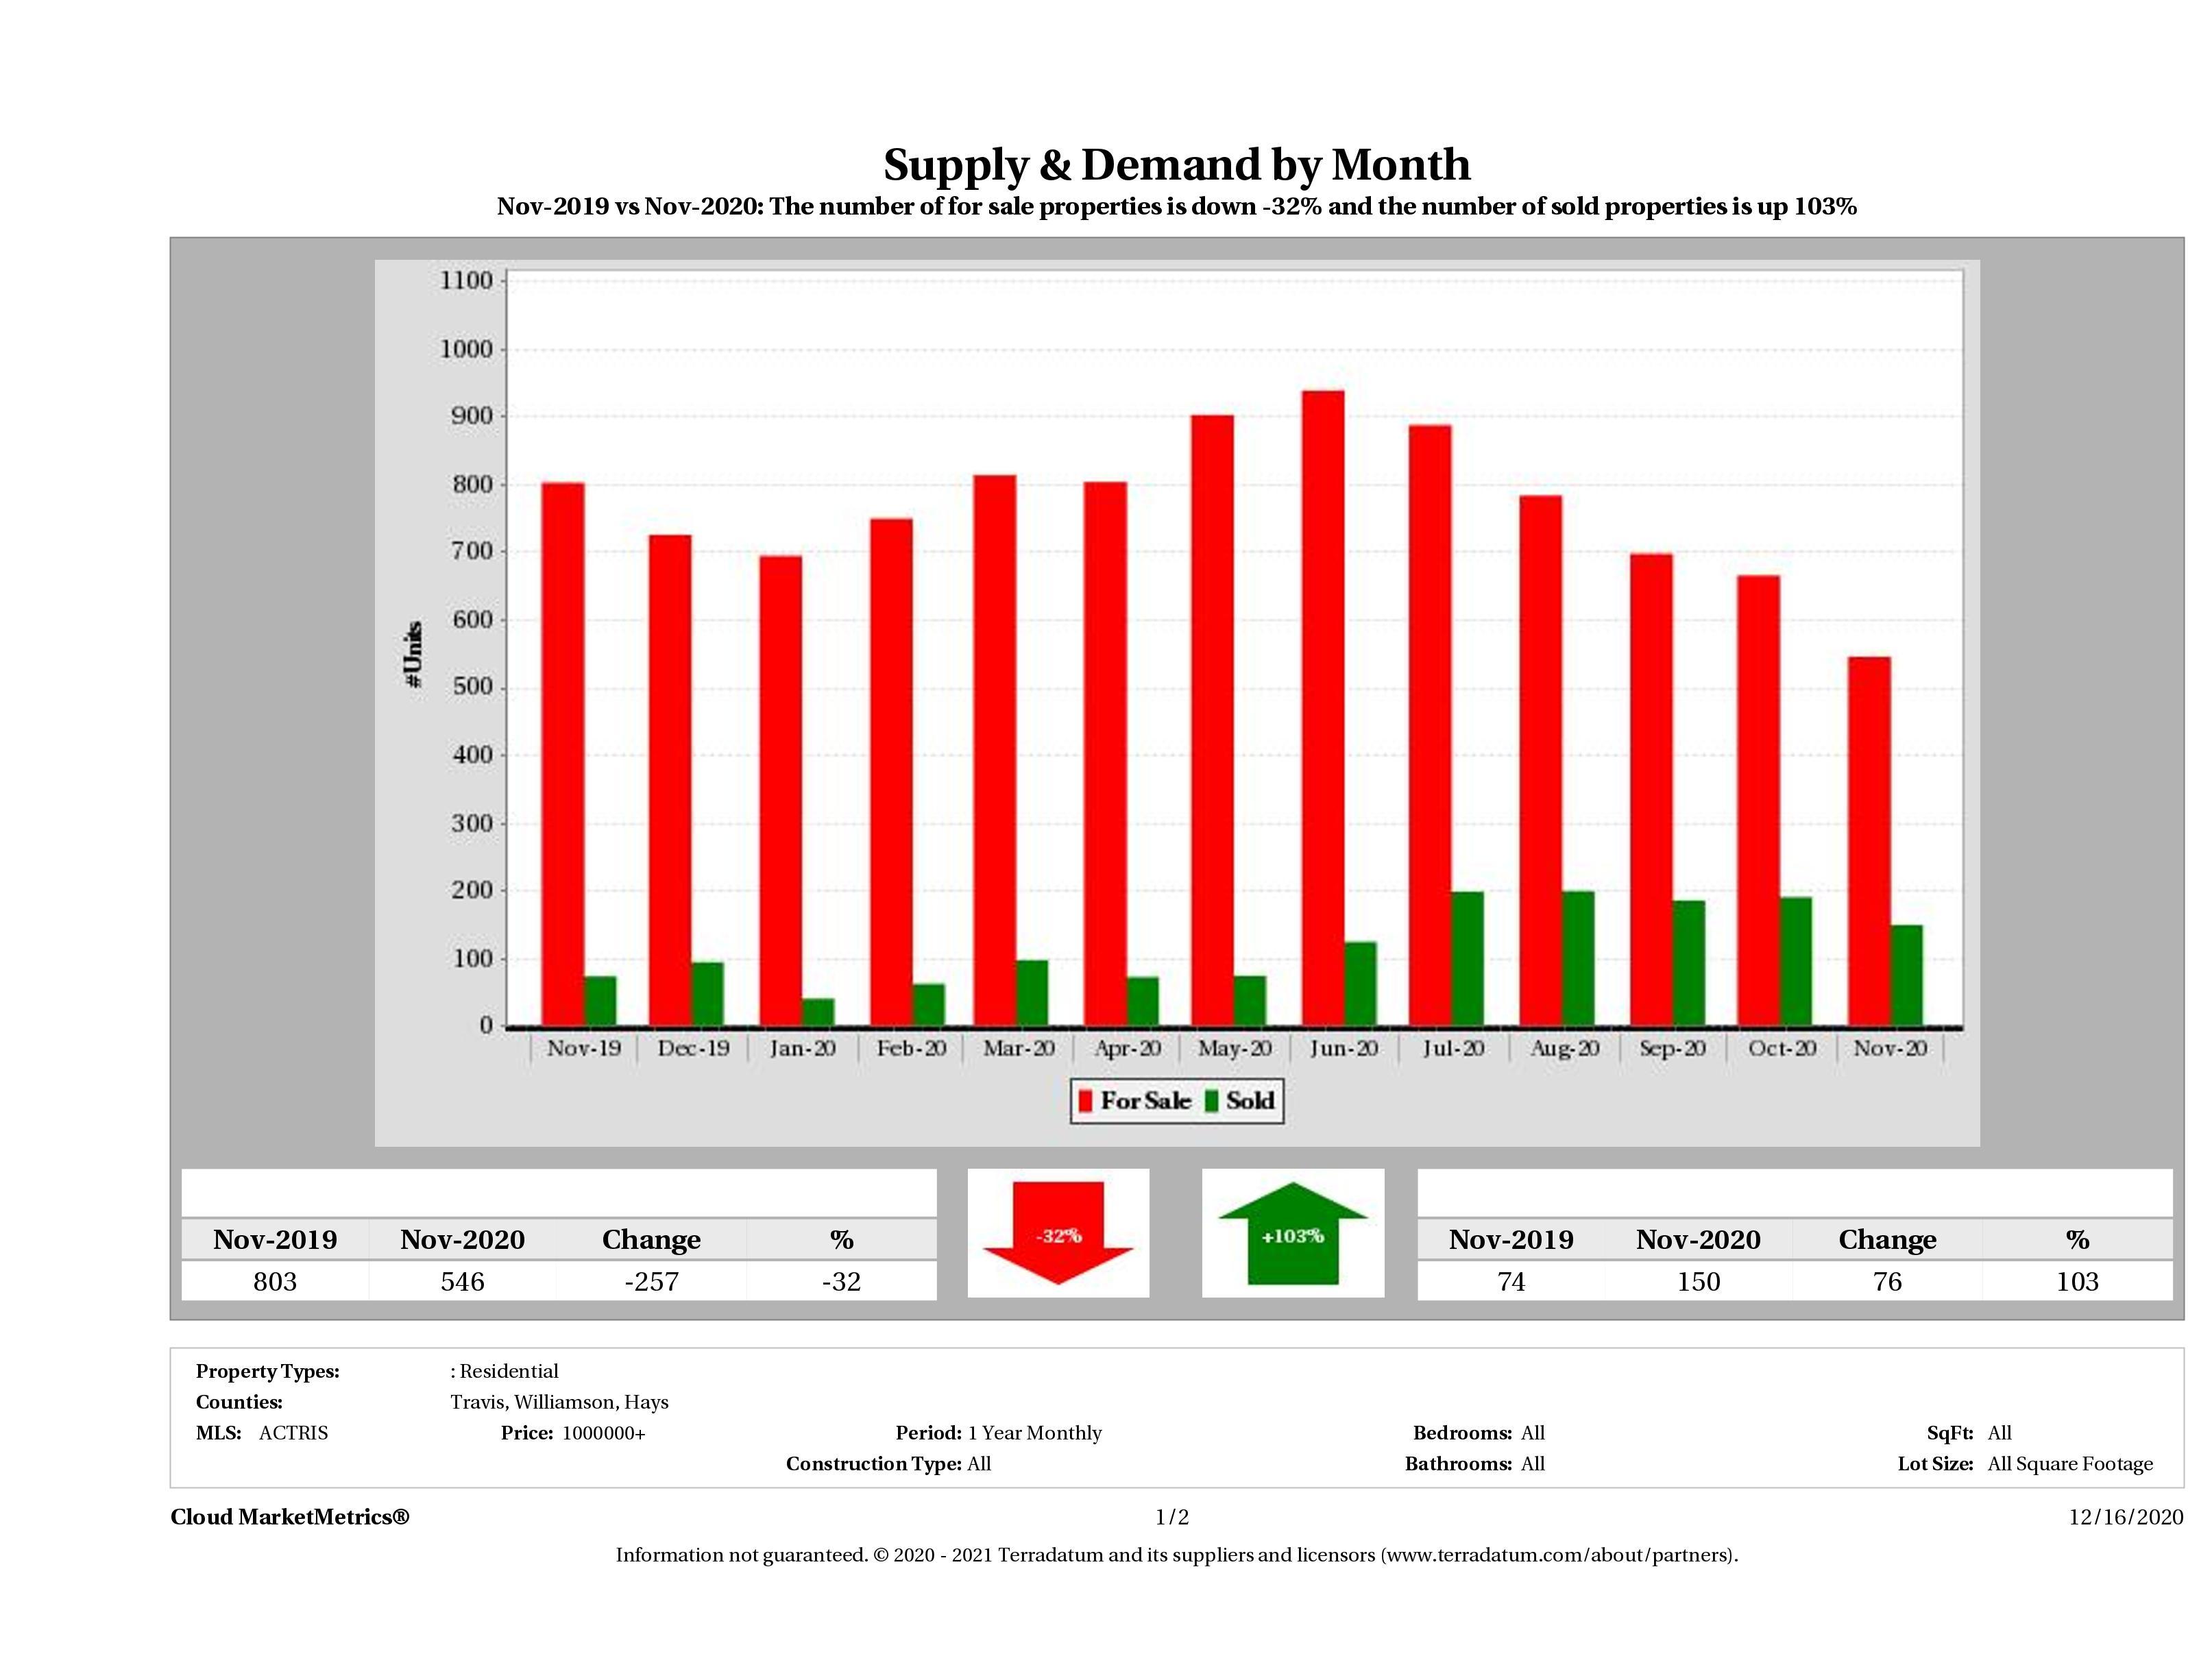 Austin luxury real estate market supply and demand November 2020